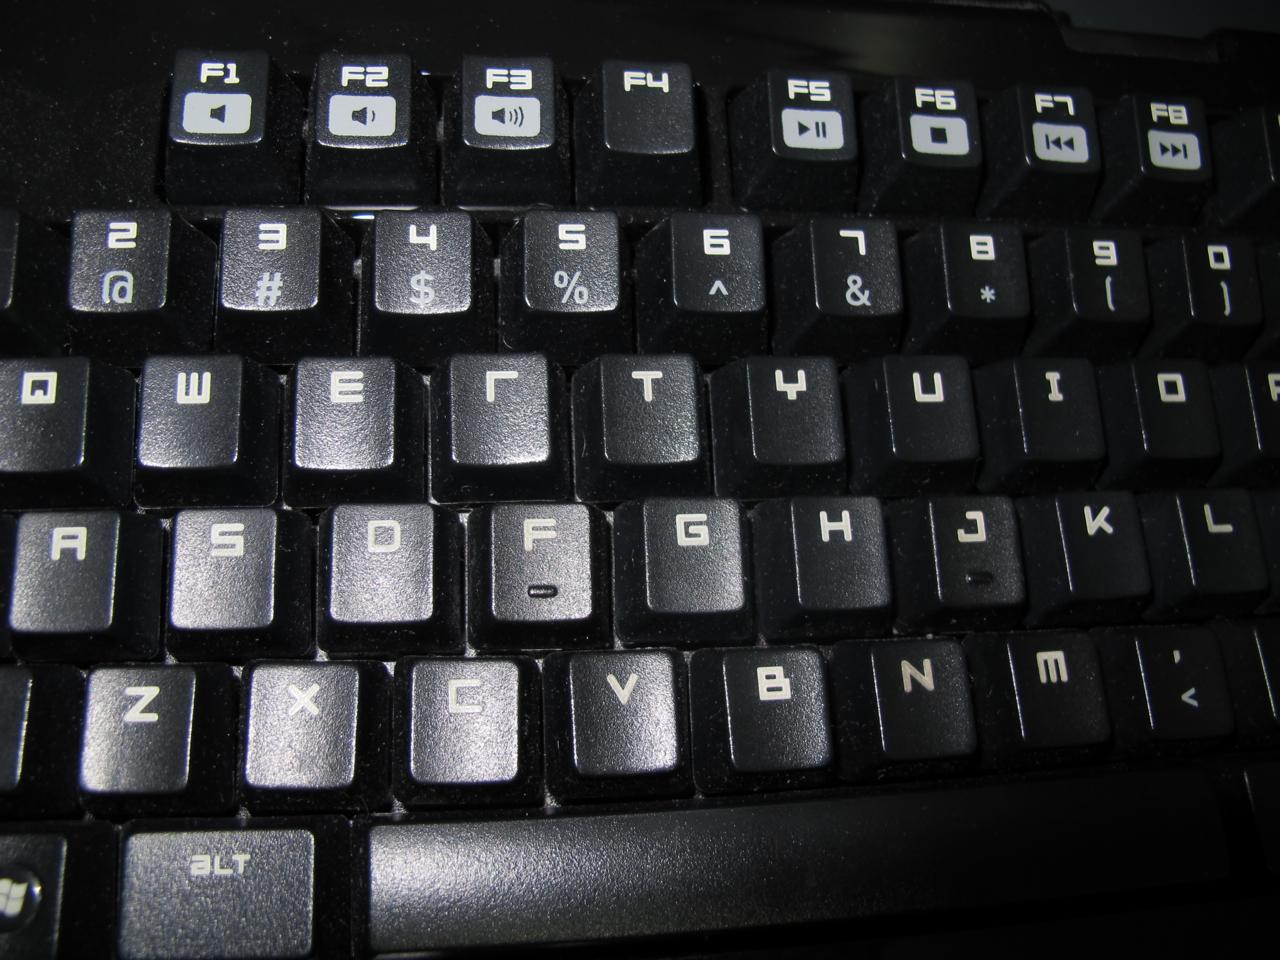 The differences include Razer BlackWidow key typeface & 2 weeks with the Razer BlackWidow mechanical keyboard: review ...